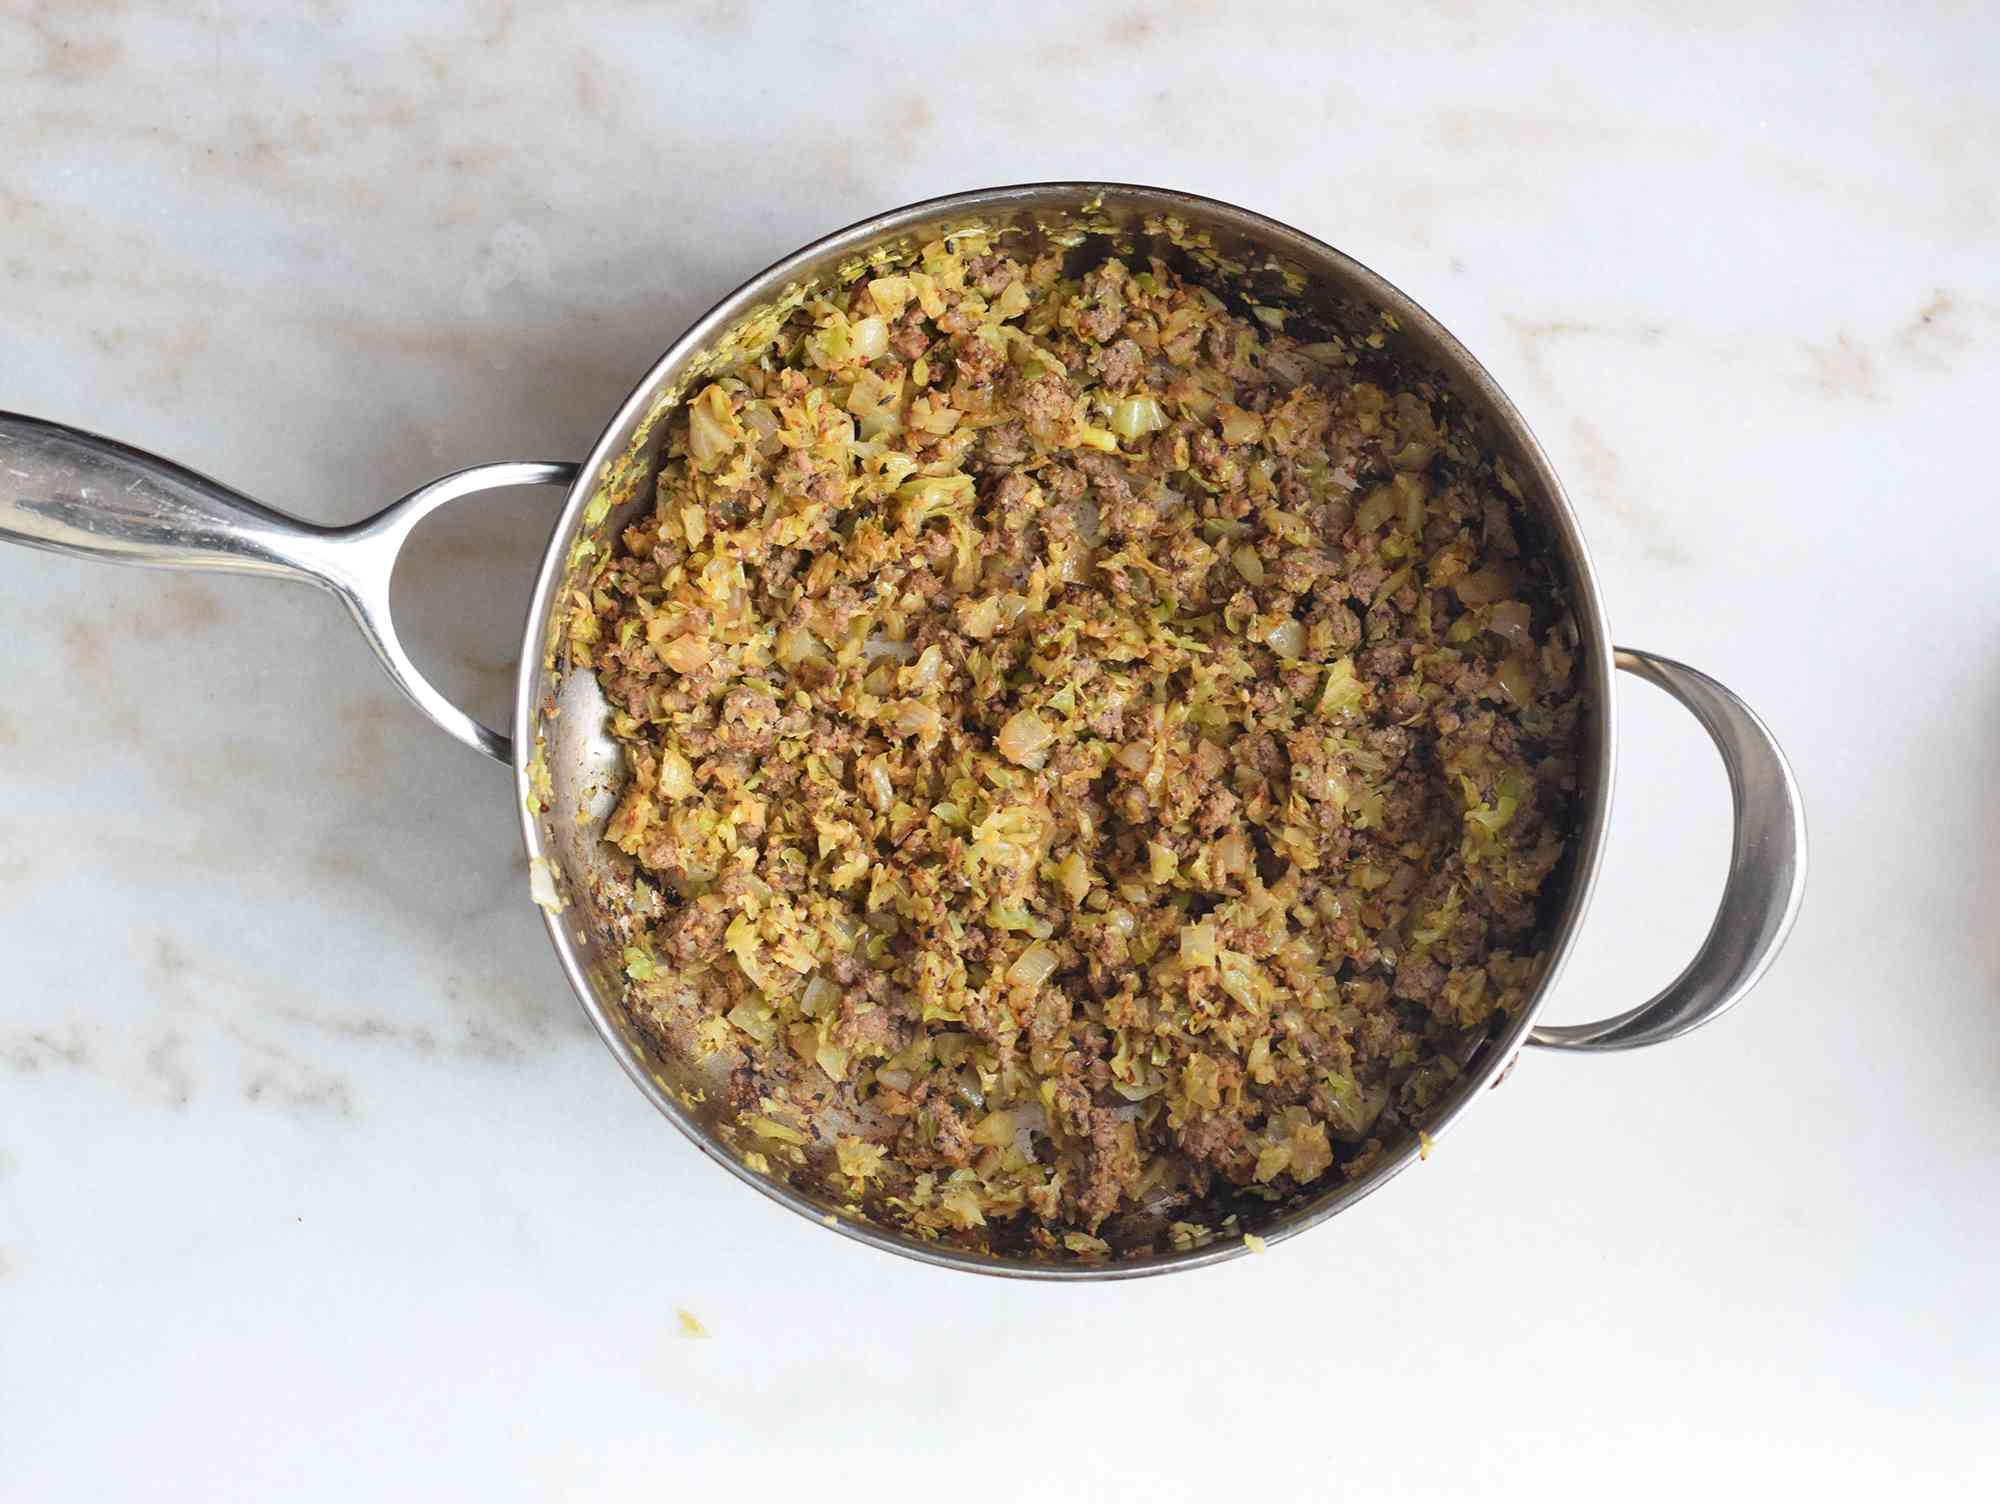 bierock filling cooked in a pan